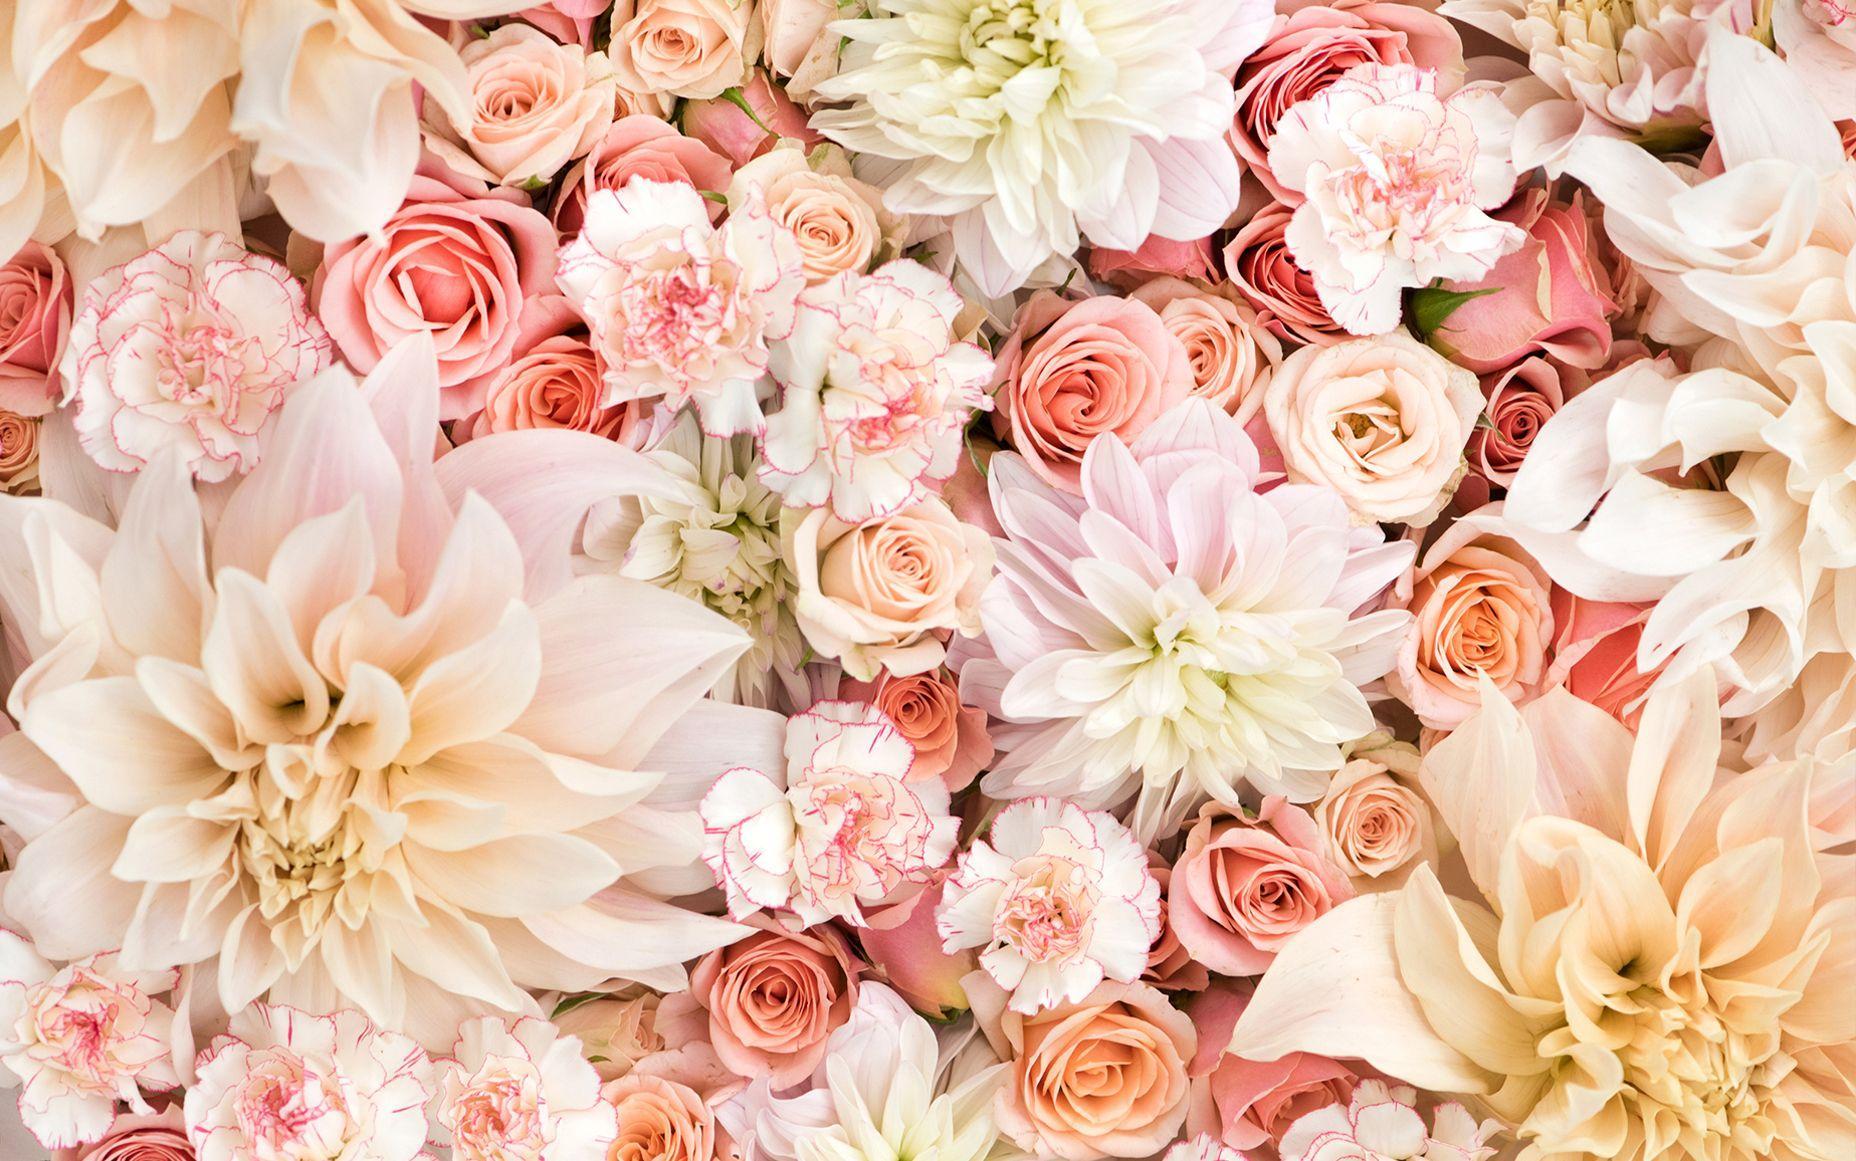 Floral Desktop Wallpapers Top Free Floral Desktop Backgrounds Wallpaperaccess